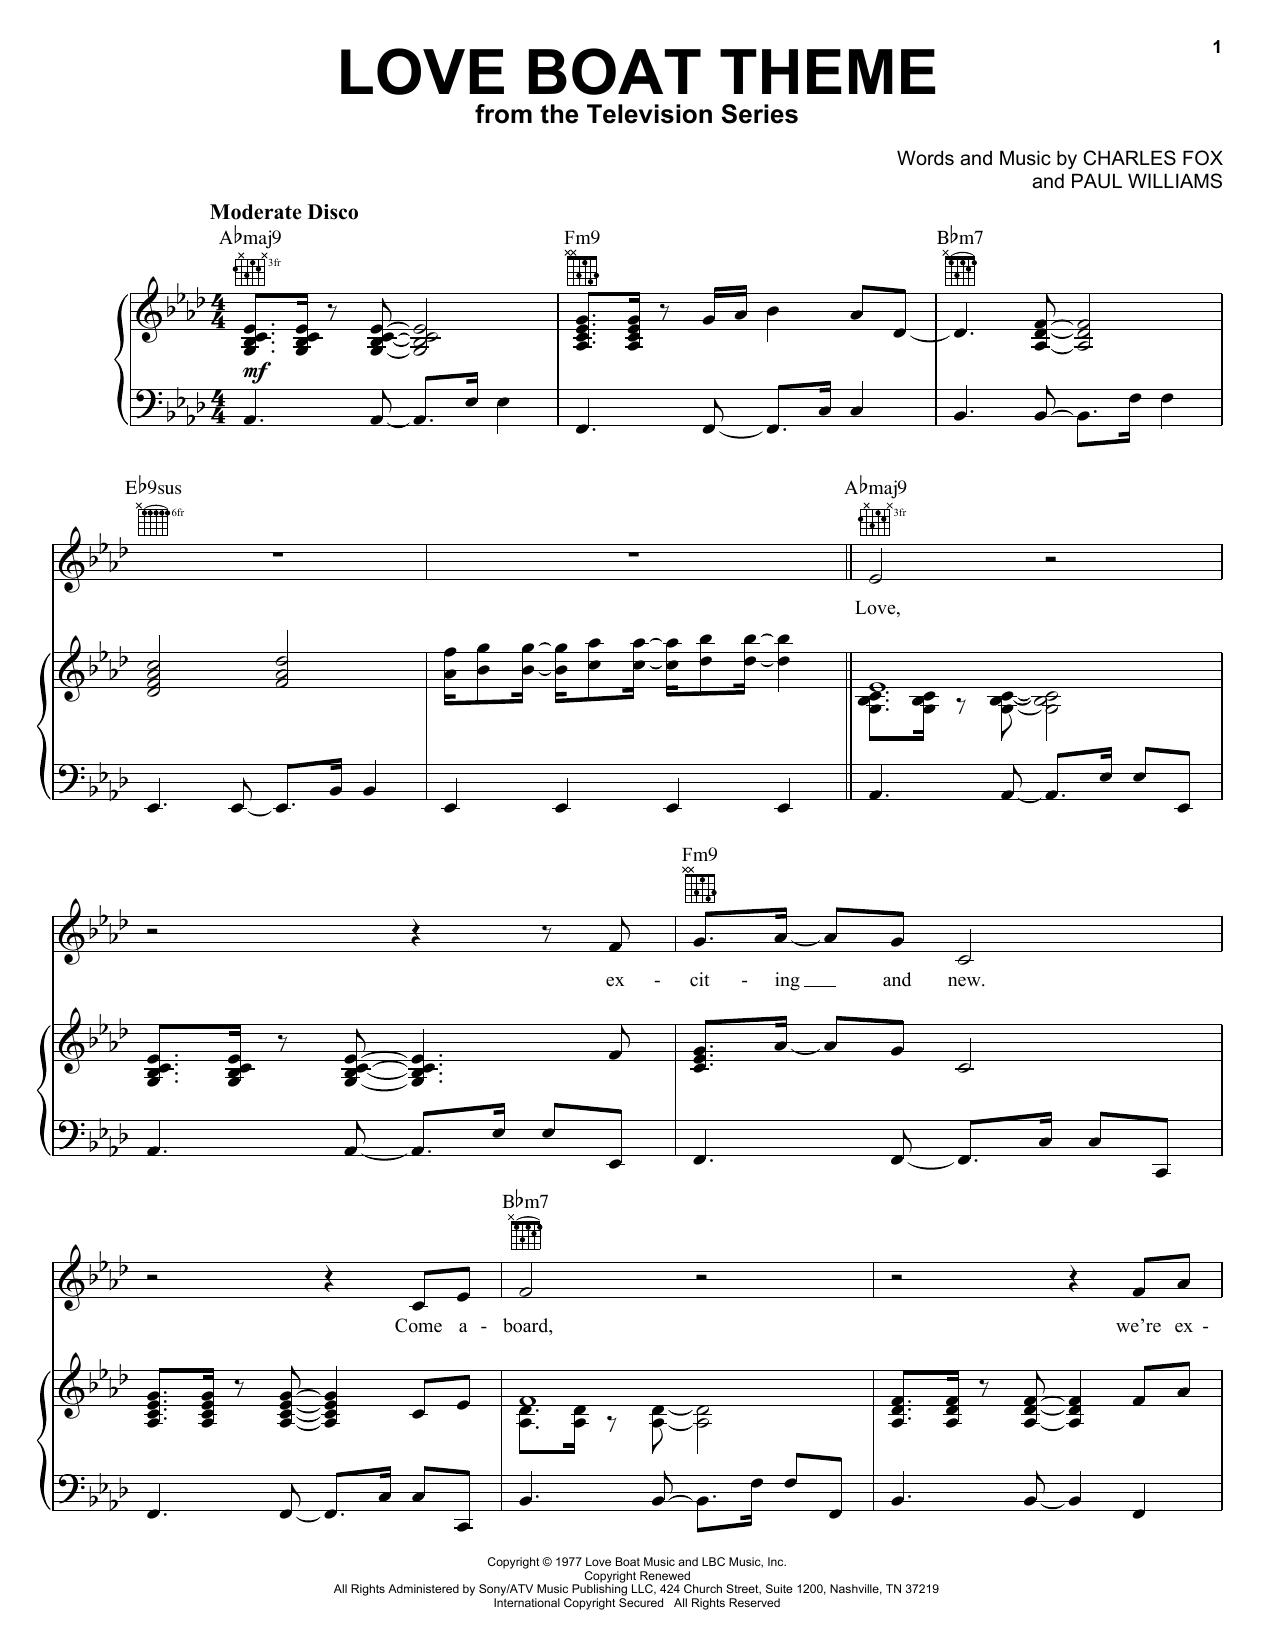 Love Boat Theme sheet music